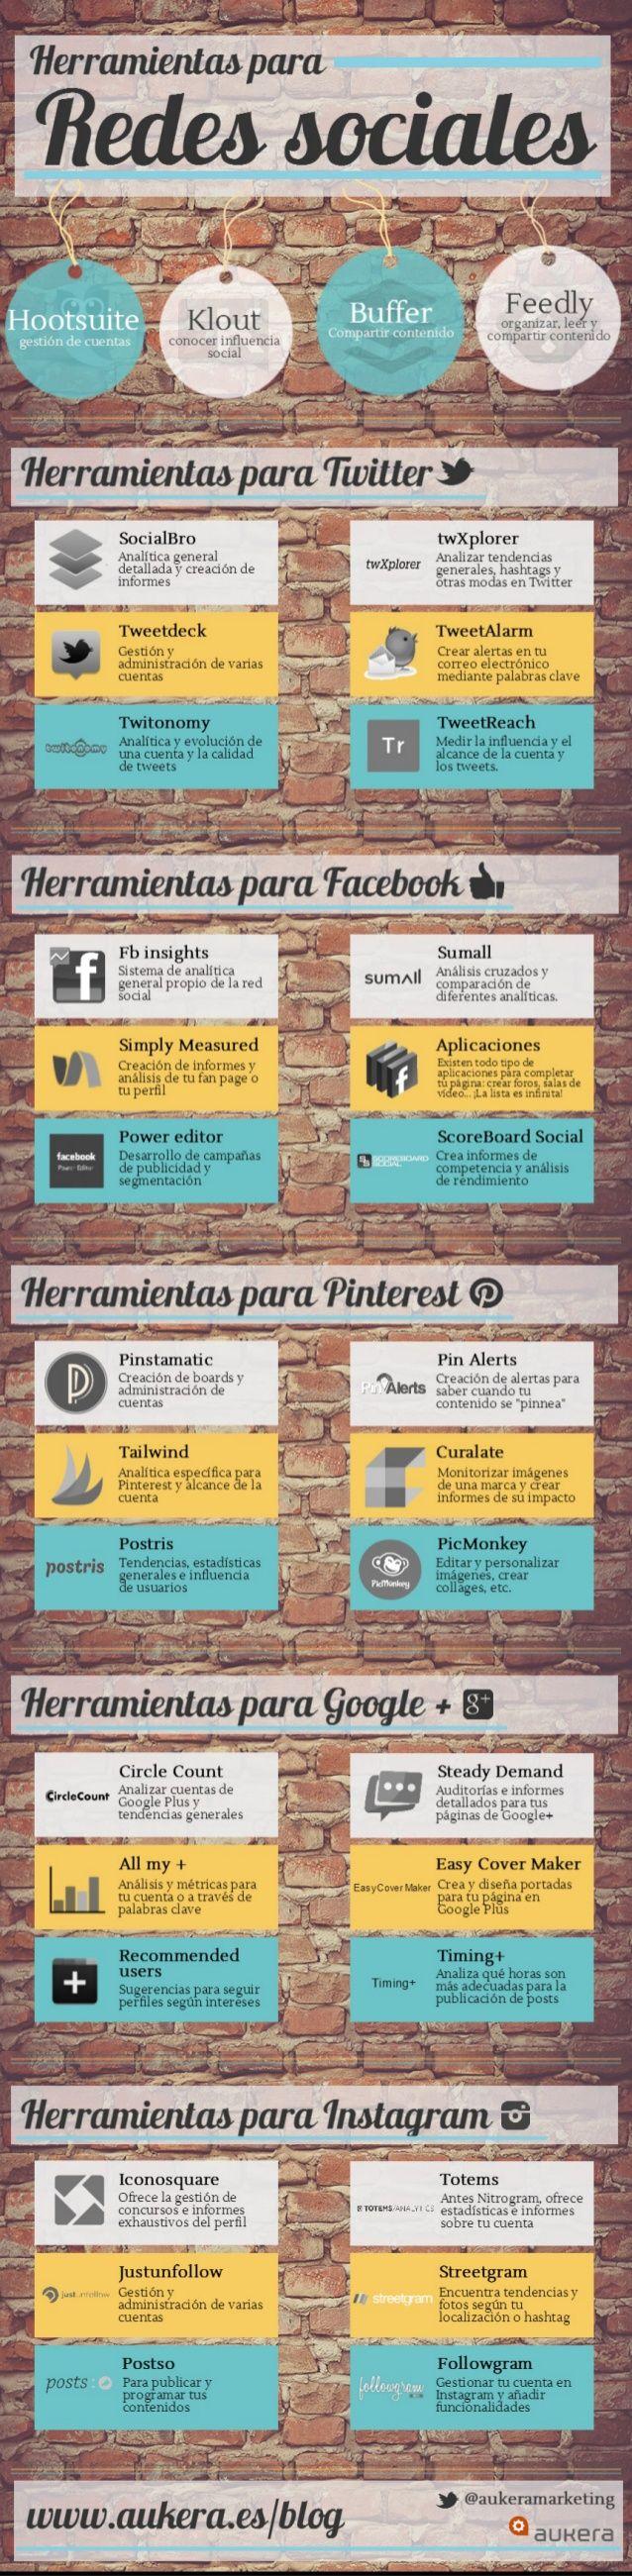 #Infografia #Herramientas para Twitter, Facebook, Pinterest, Google Plus e Instagram. #TAVnews